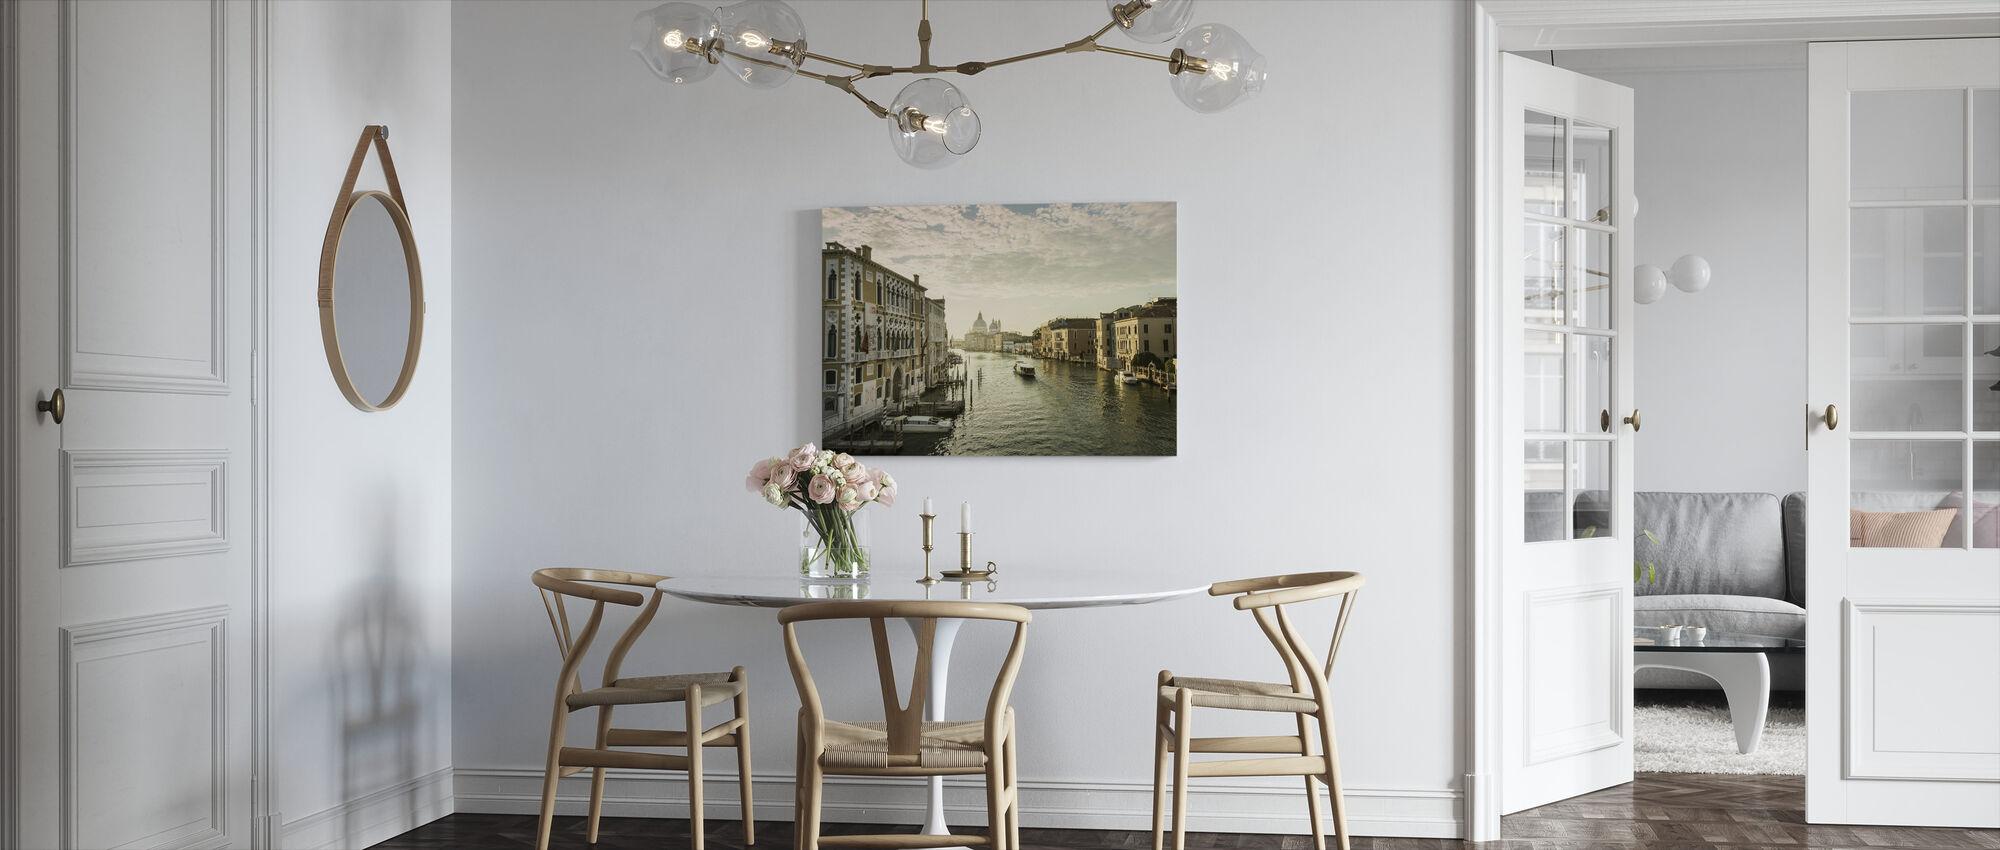 Sunny Venice - Canvas print - Kitchen